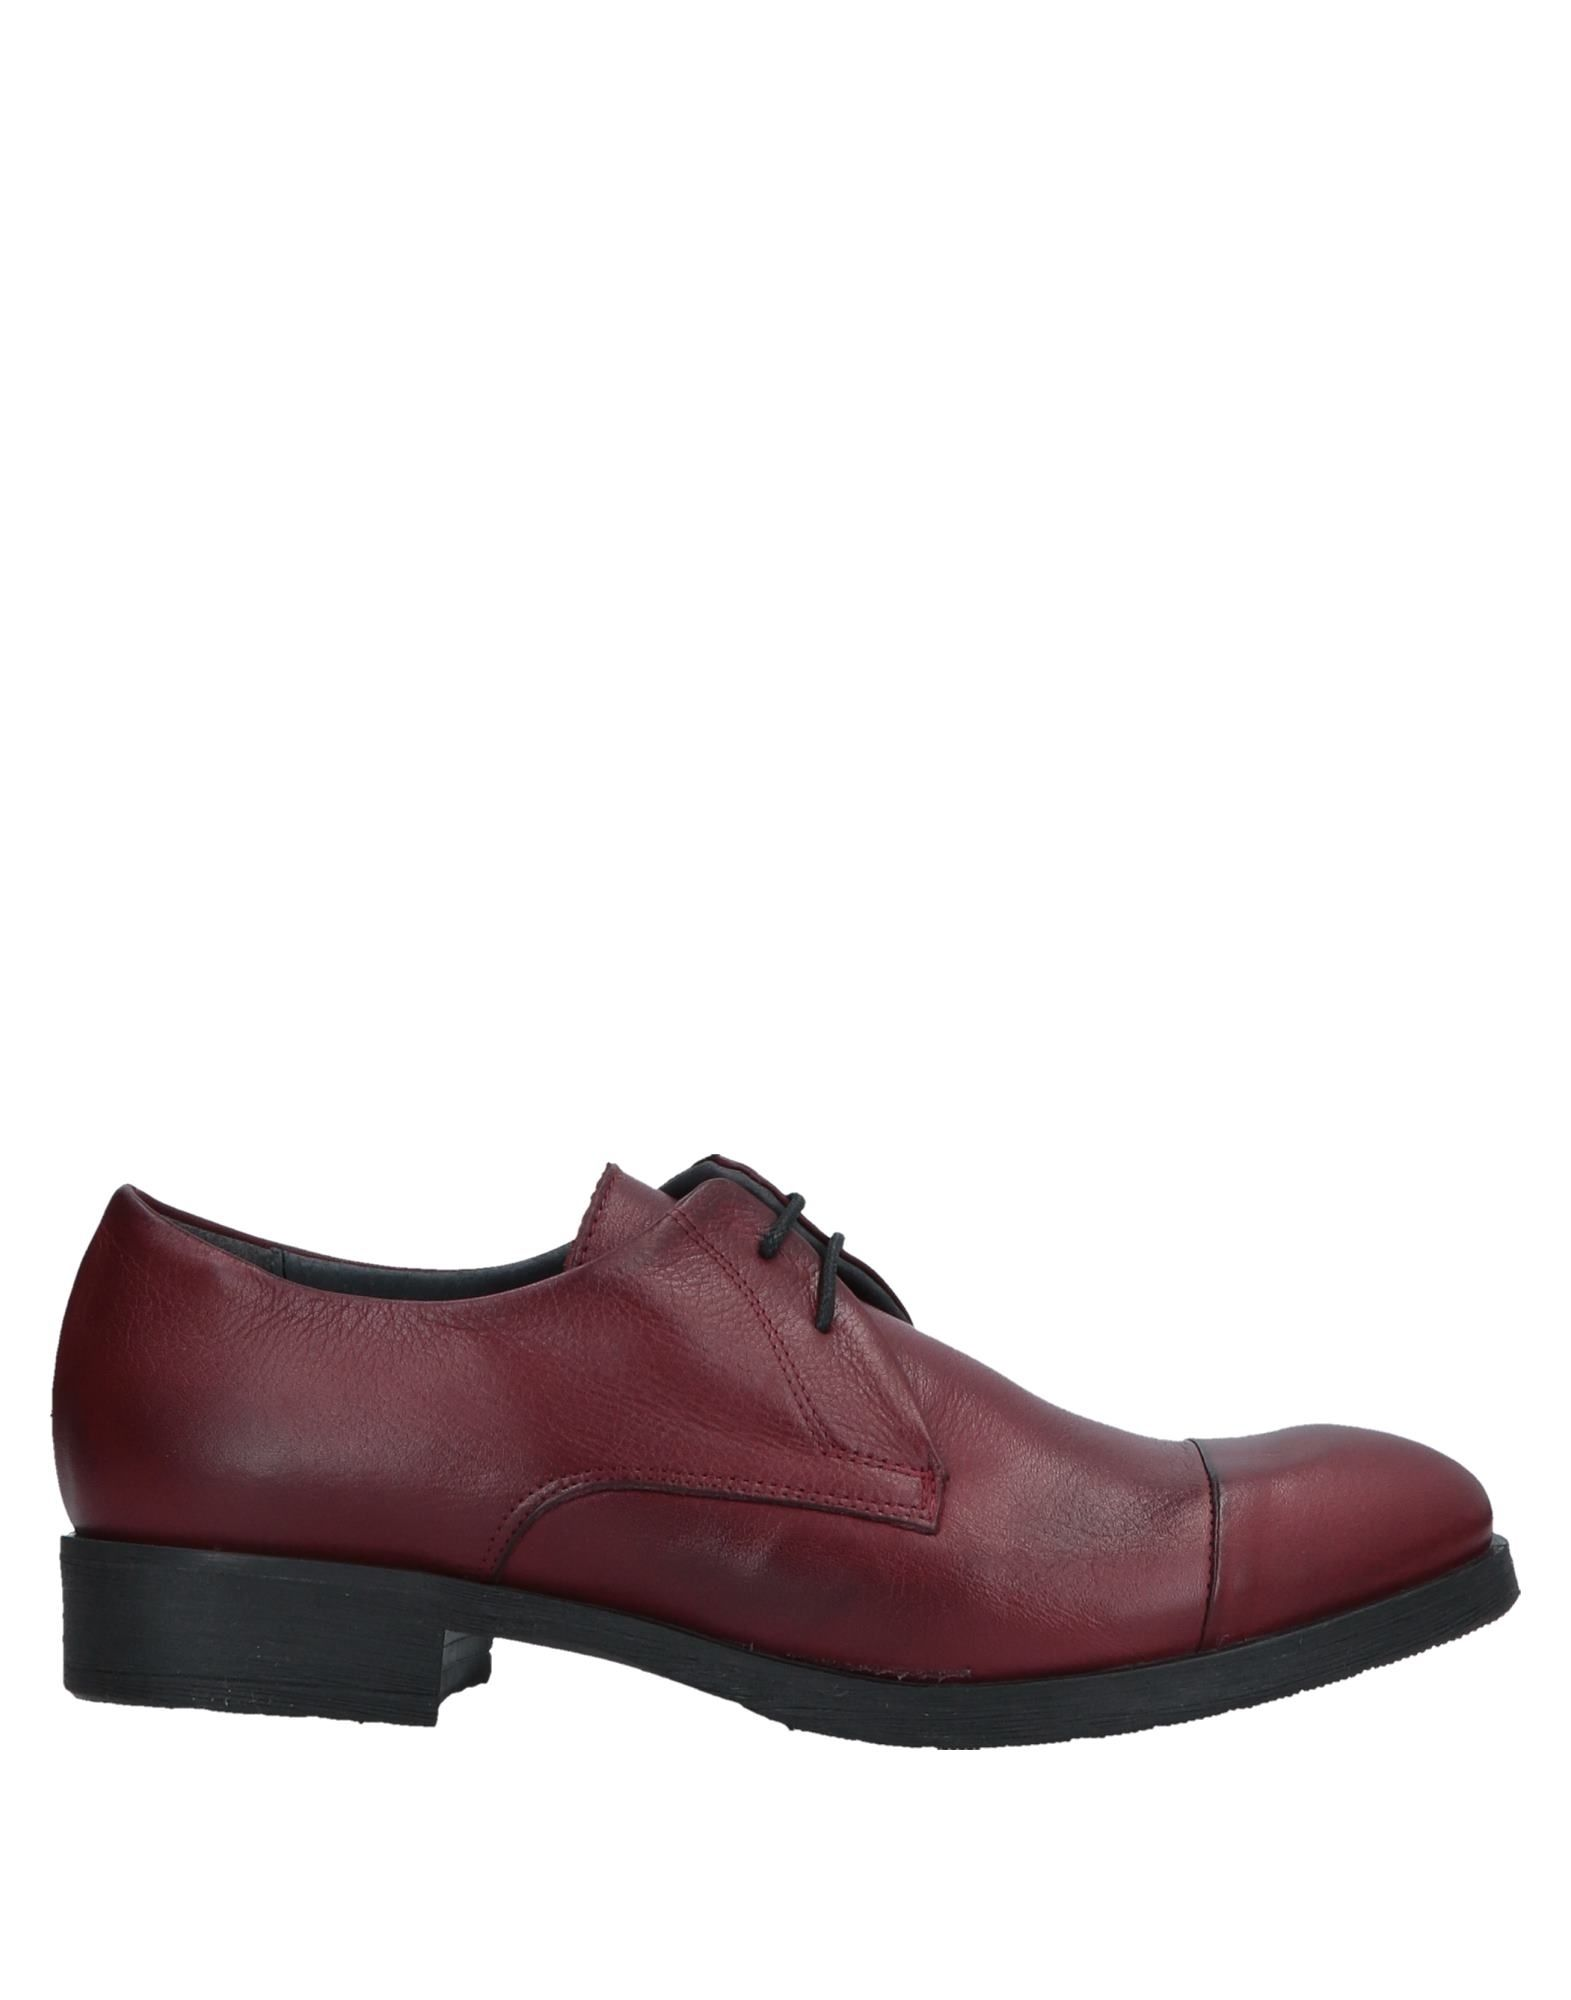 Фото - PIAMPIANI Обувь на шнурках обувь на высокой платформе dkny